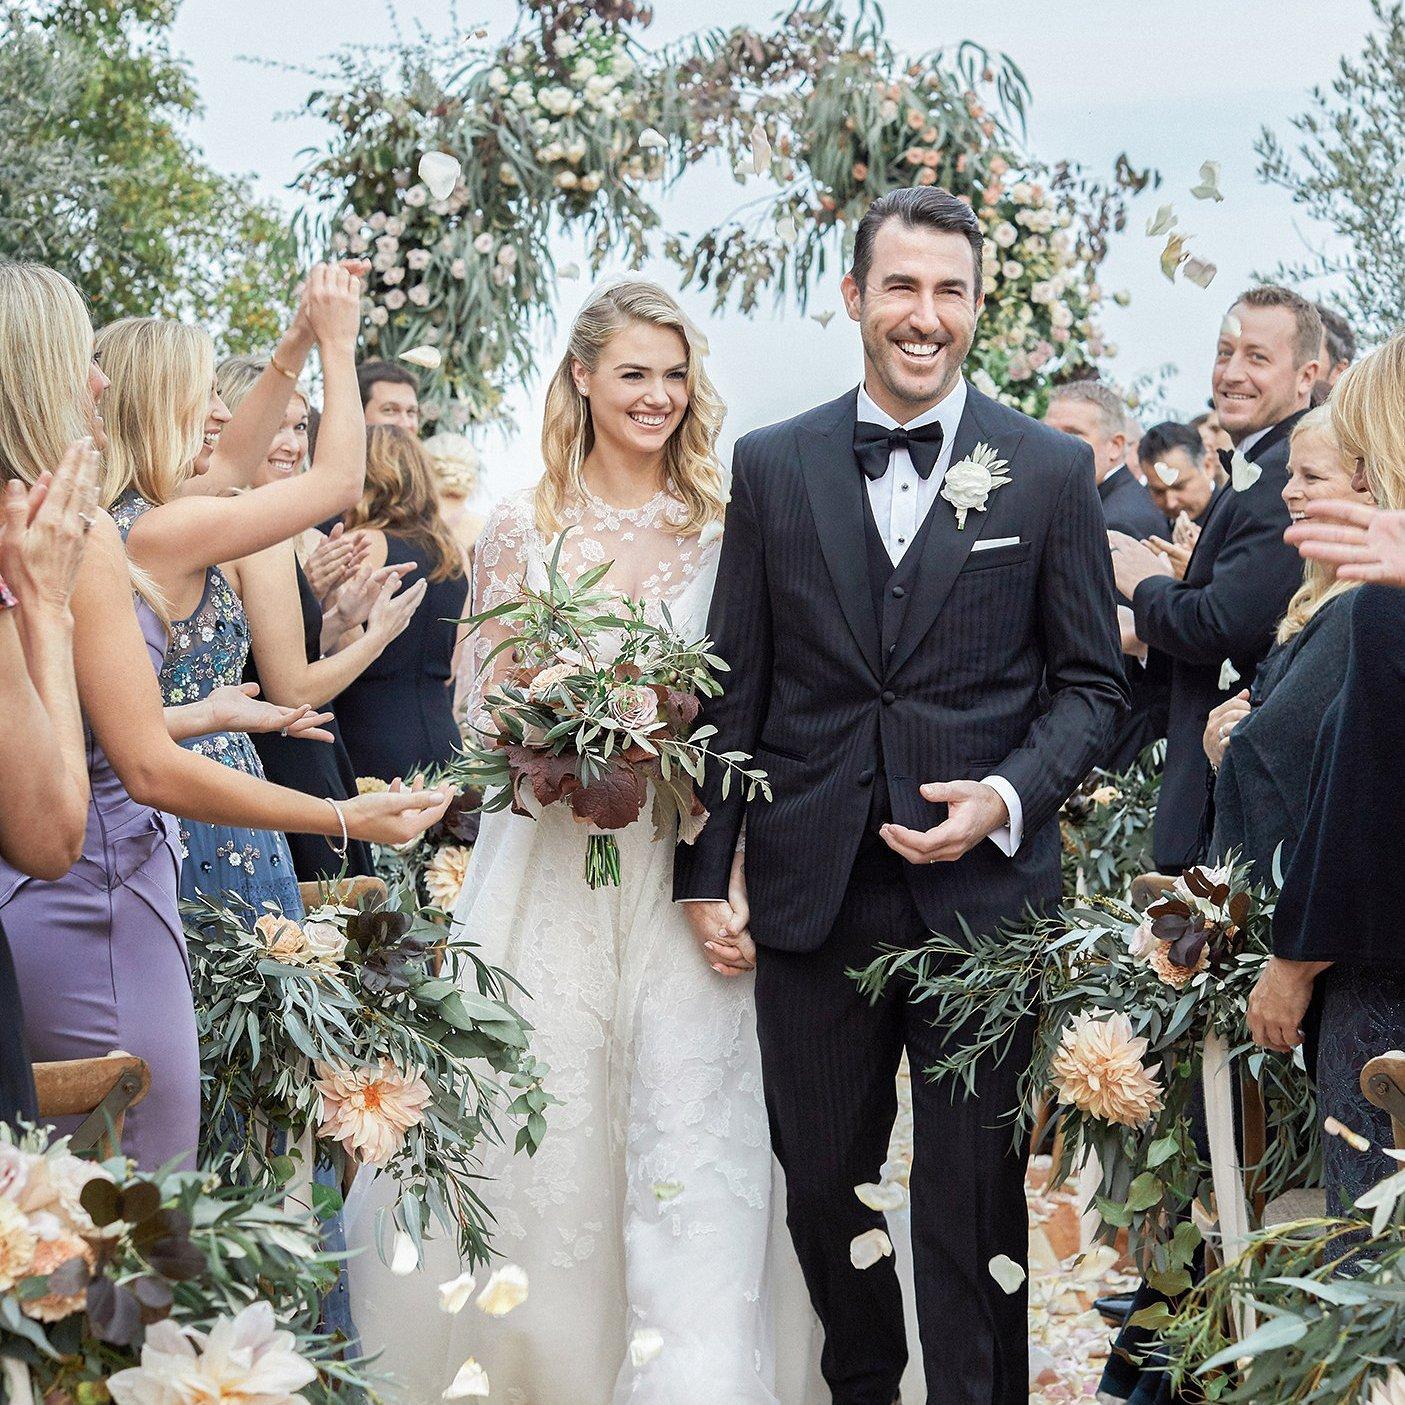 20-kate-upton-and-justin-verlander-wedding